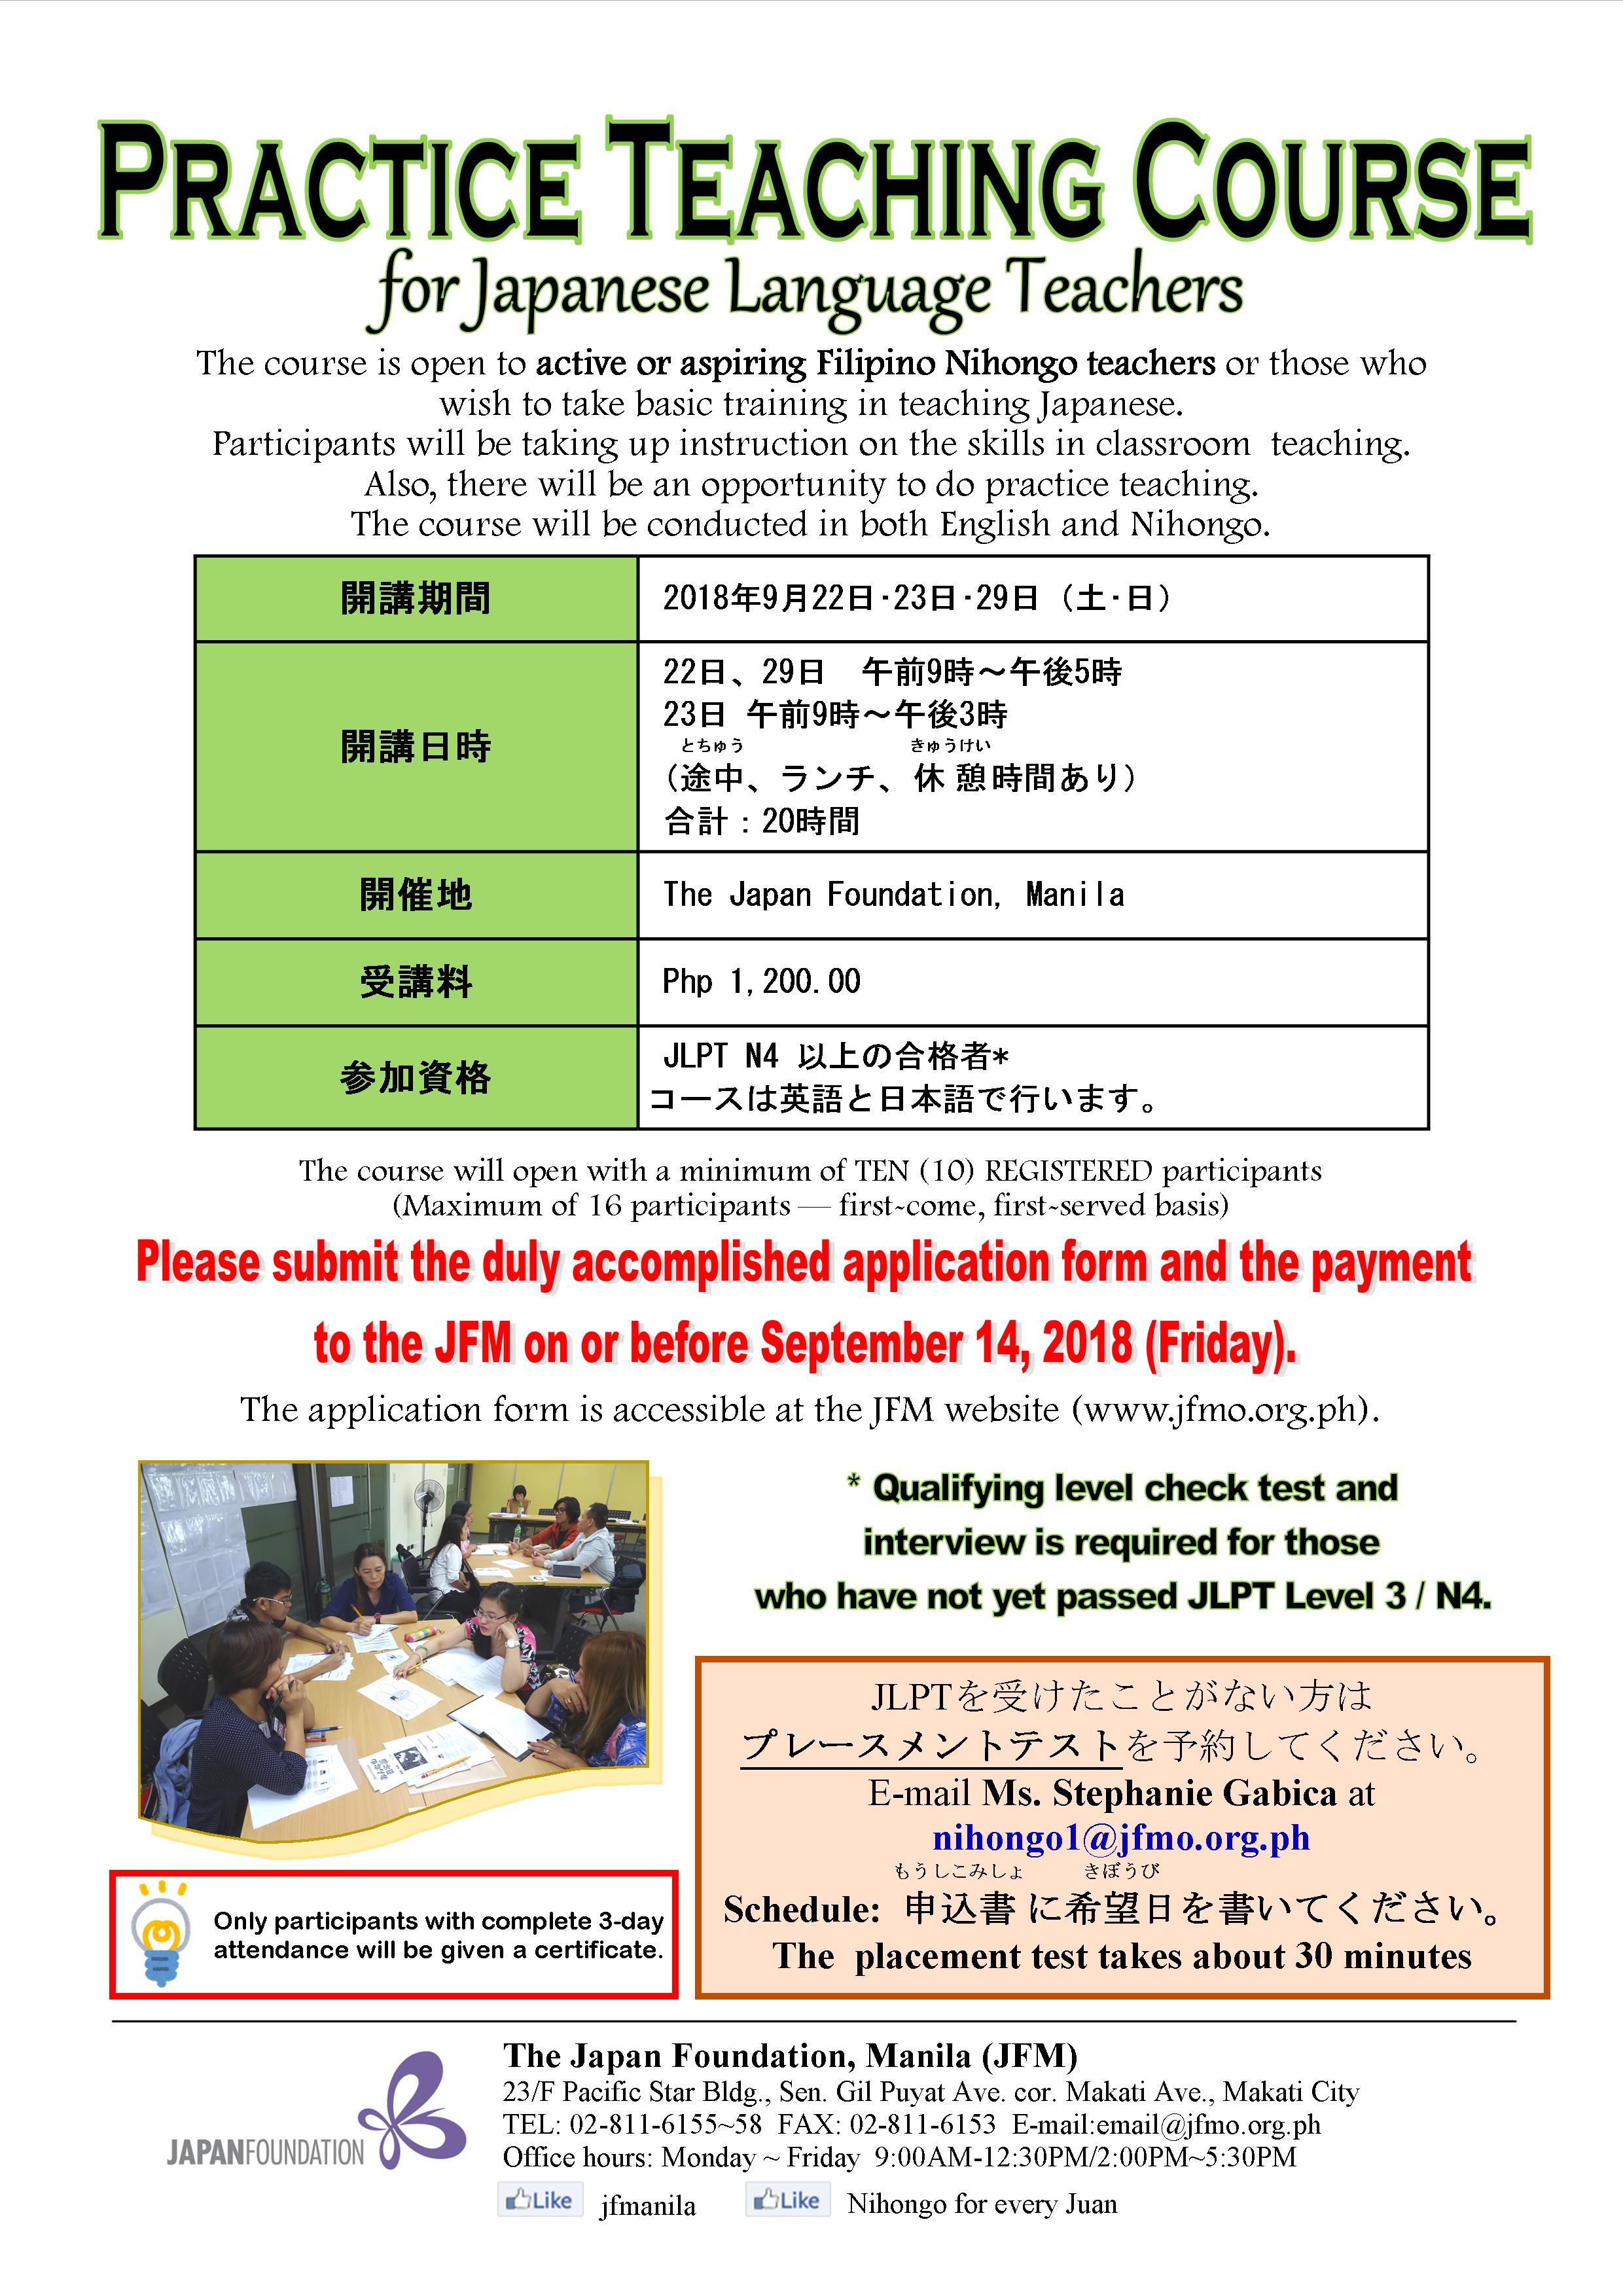 Practice Teaching Course in Manila – Sept. 22, 23 & 29